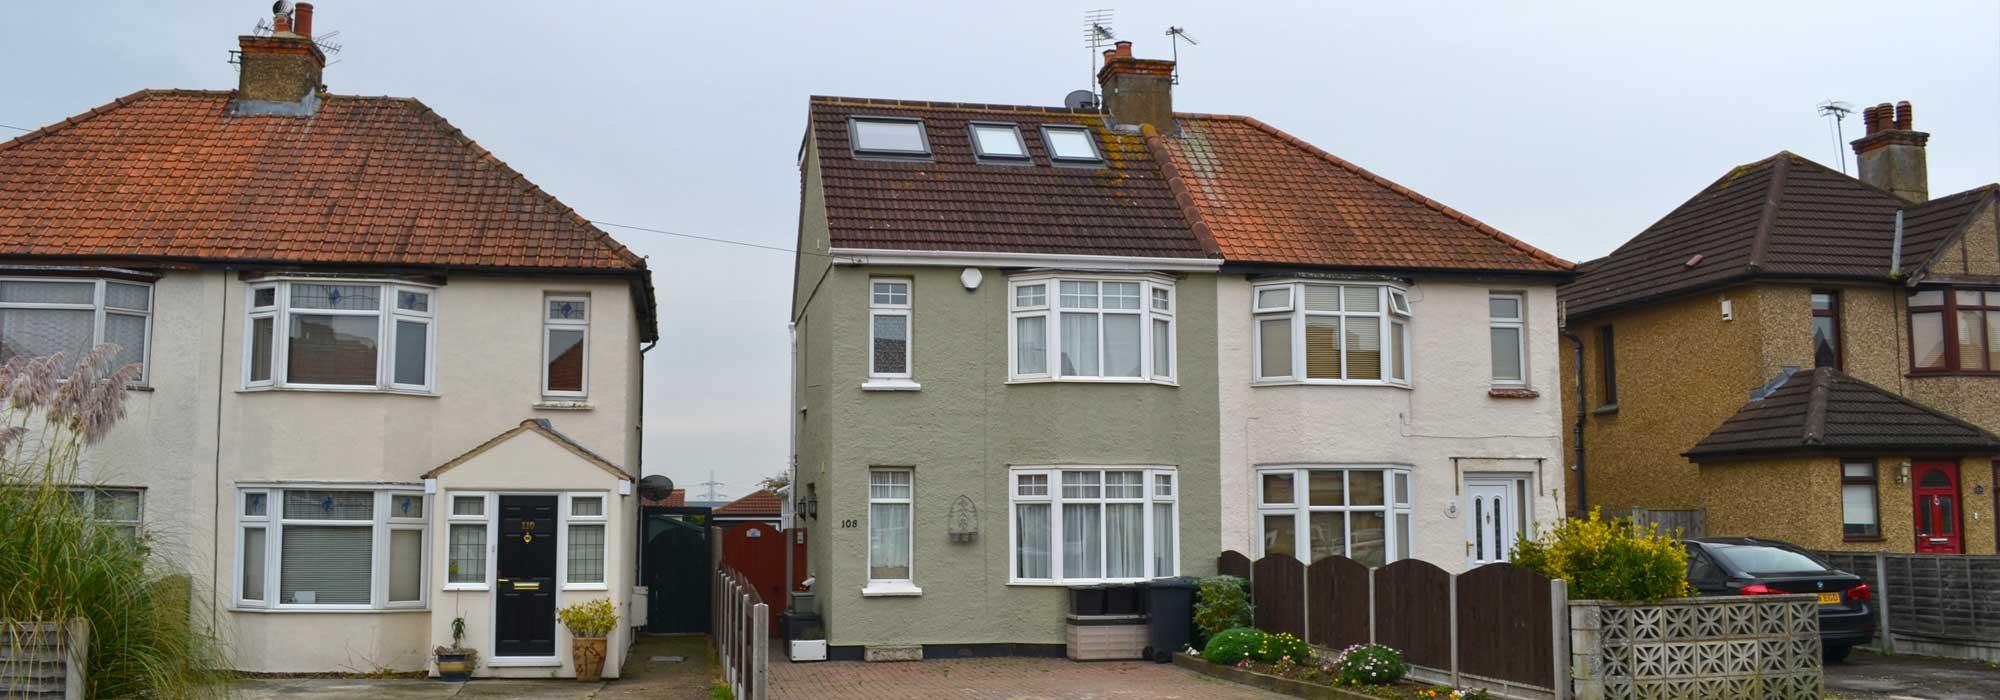 Stortford Road, Hoddesdon, Hertfordshire, EN11 0AW